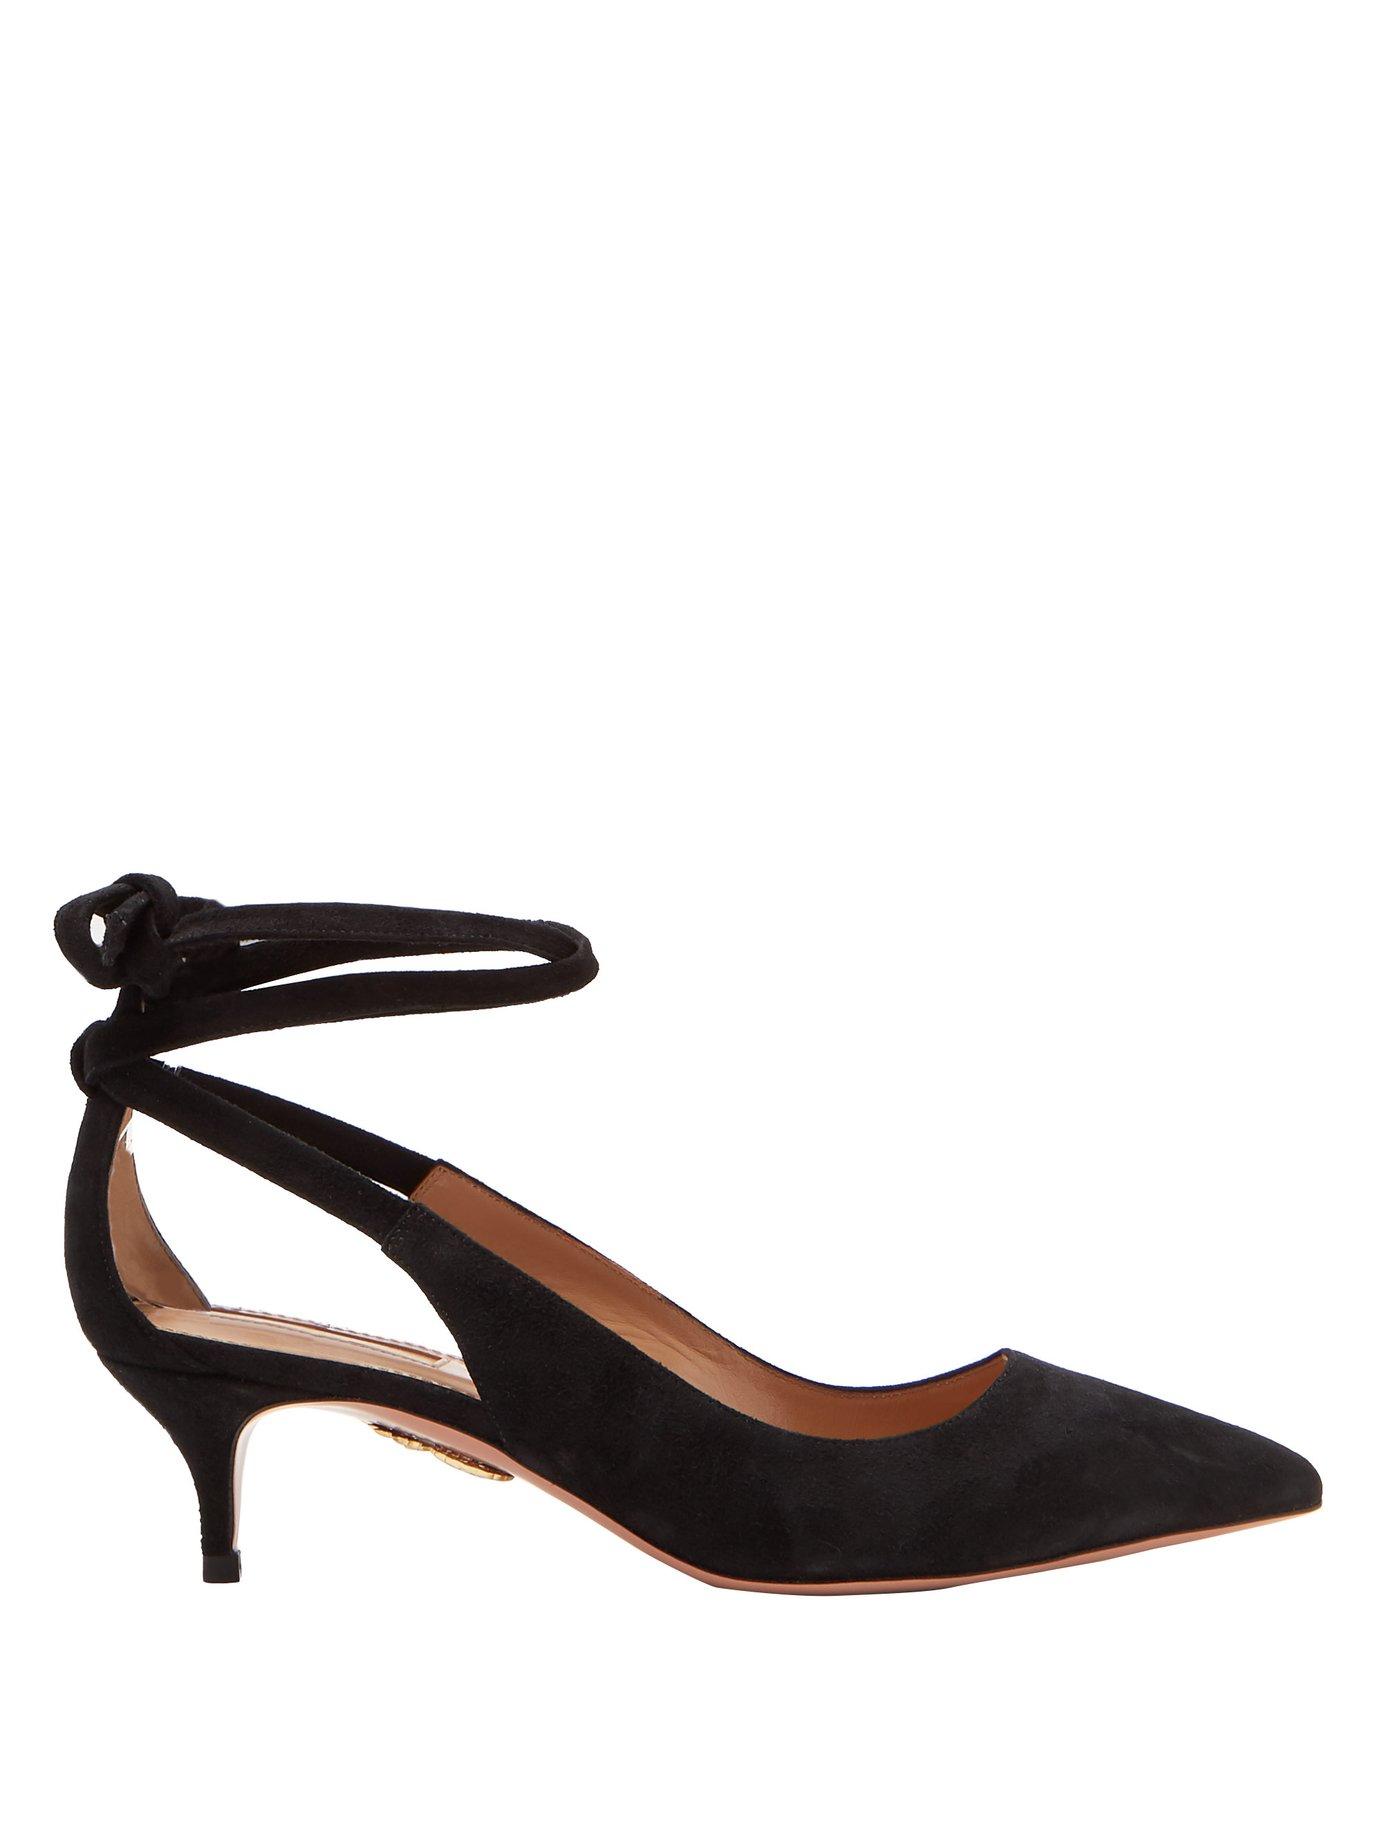 Aquazurra suede shoes